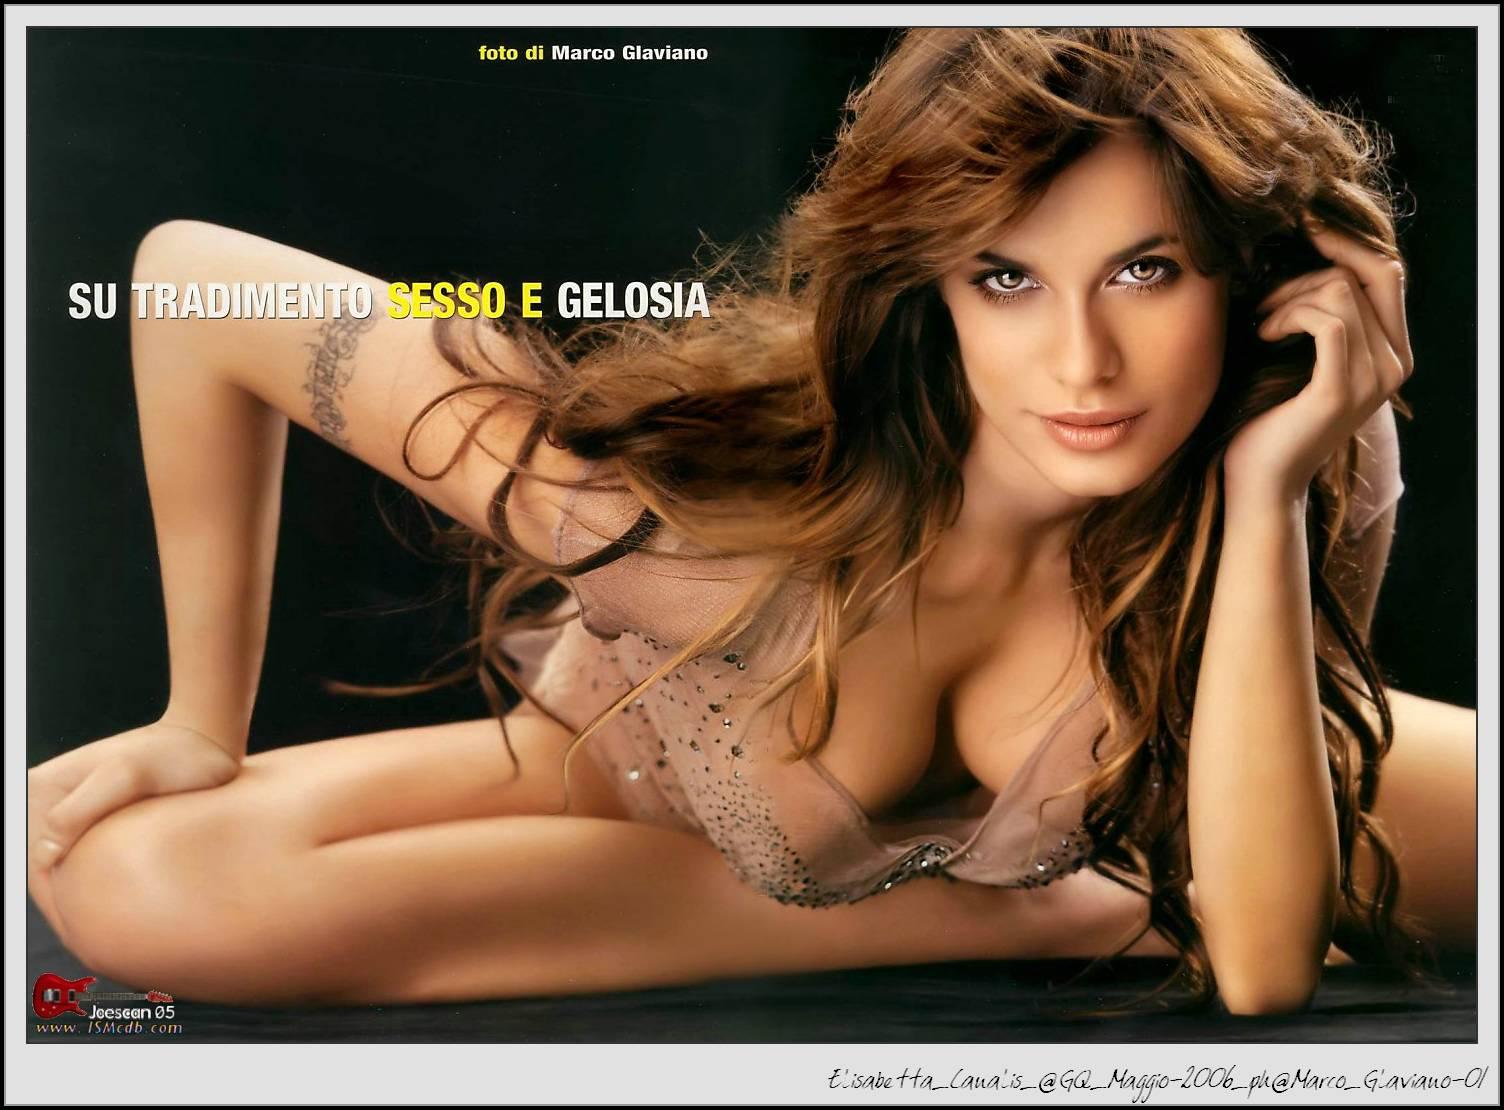 http://2.bp.blogspot.com/-go-BgiQsEHo/TtsTFvtMB4I/AAAAAAAAFJs/TrhLhl-_4Ls/s1600/Elisabetta_Canalis_9.jpg